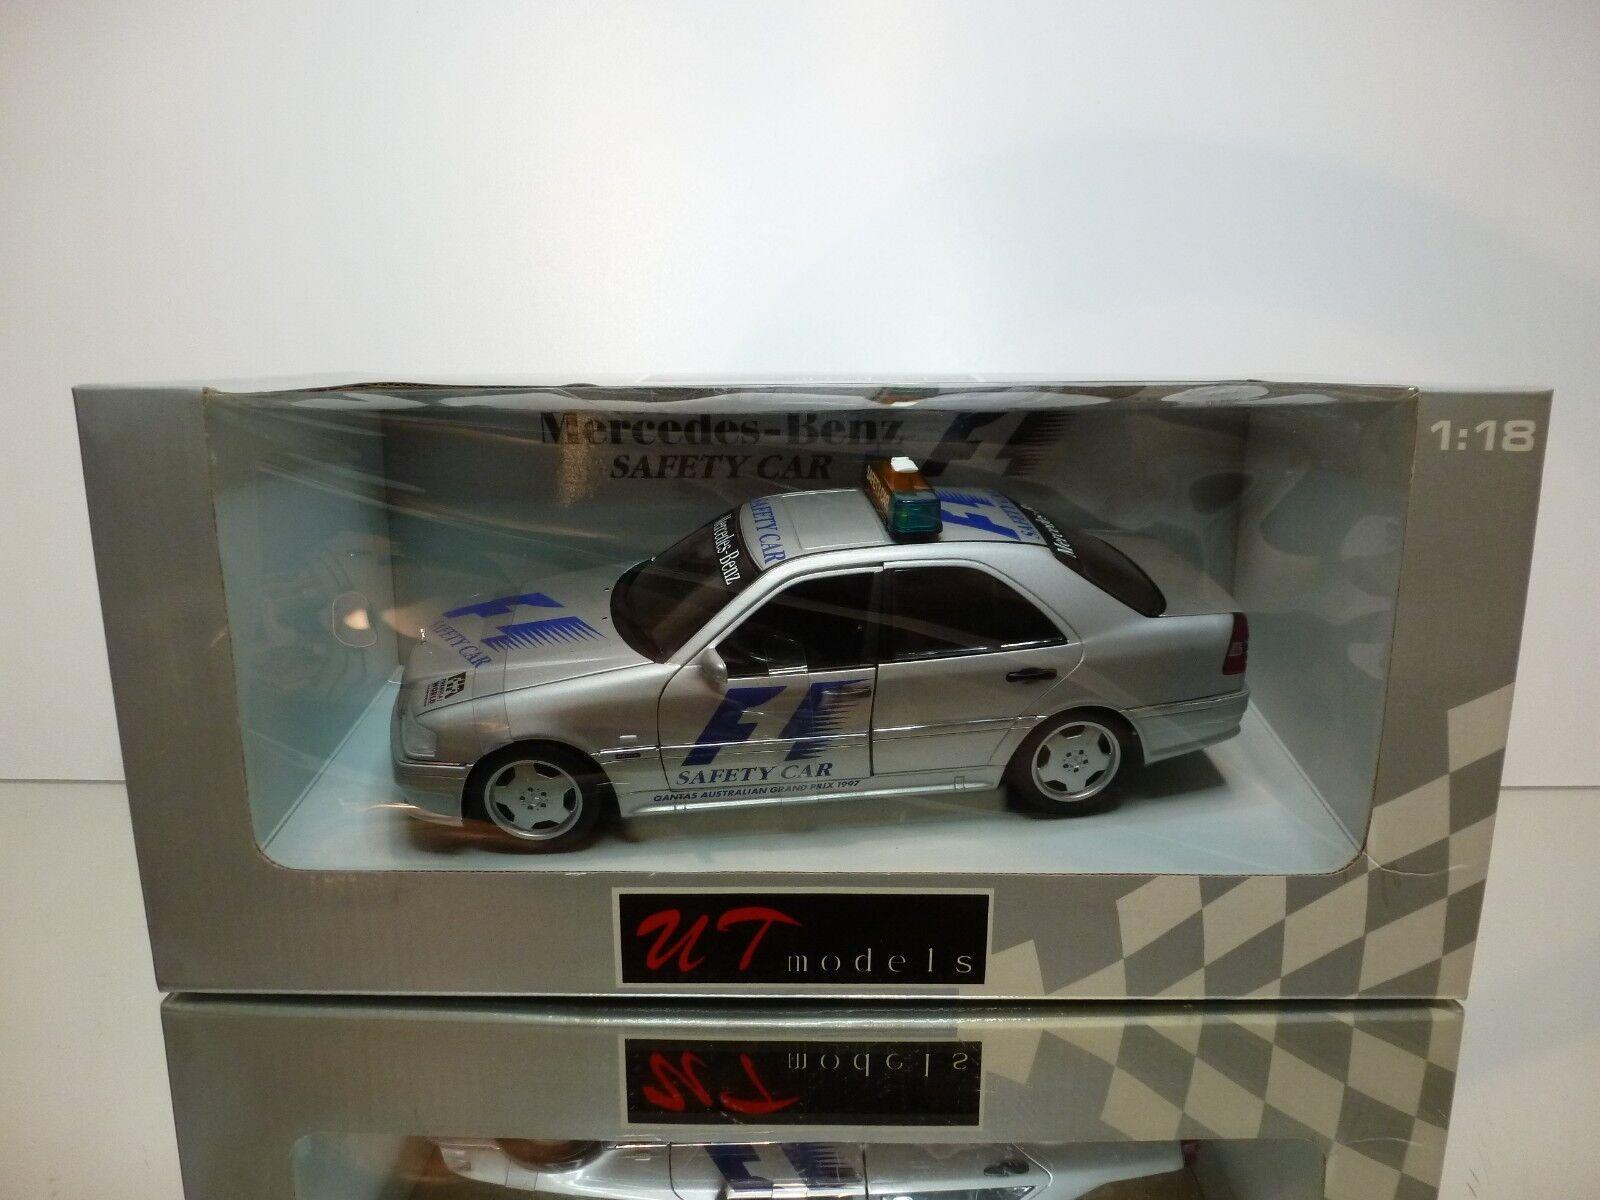 UT MODELS 26105 MERCEDES BENZ C AMG SAFETY CAR F1 1997 - 1 18 - EXCELLENT IN BOX